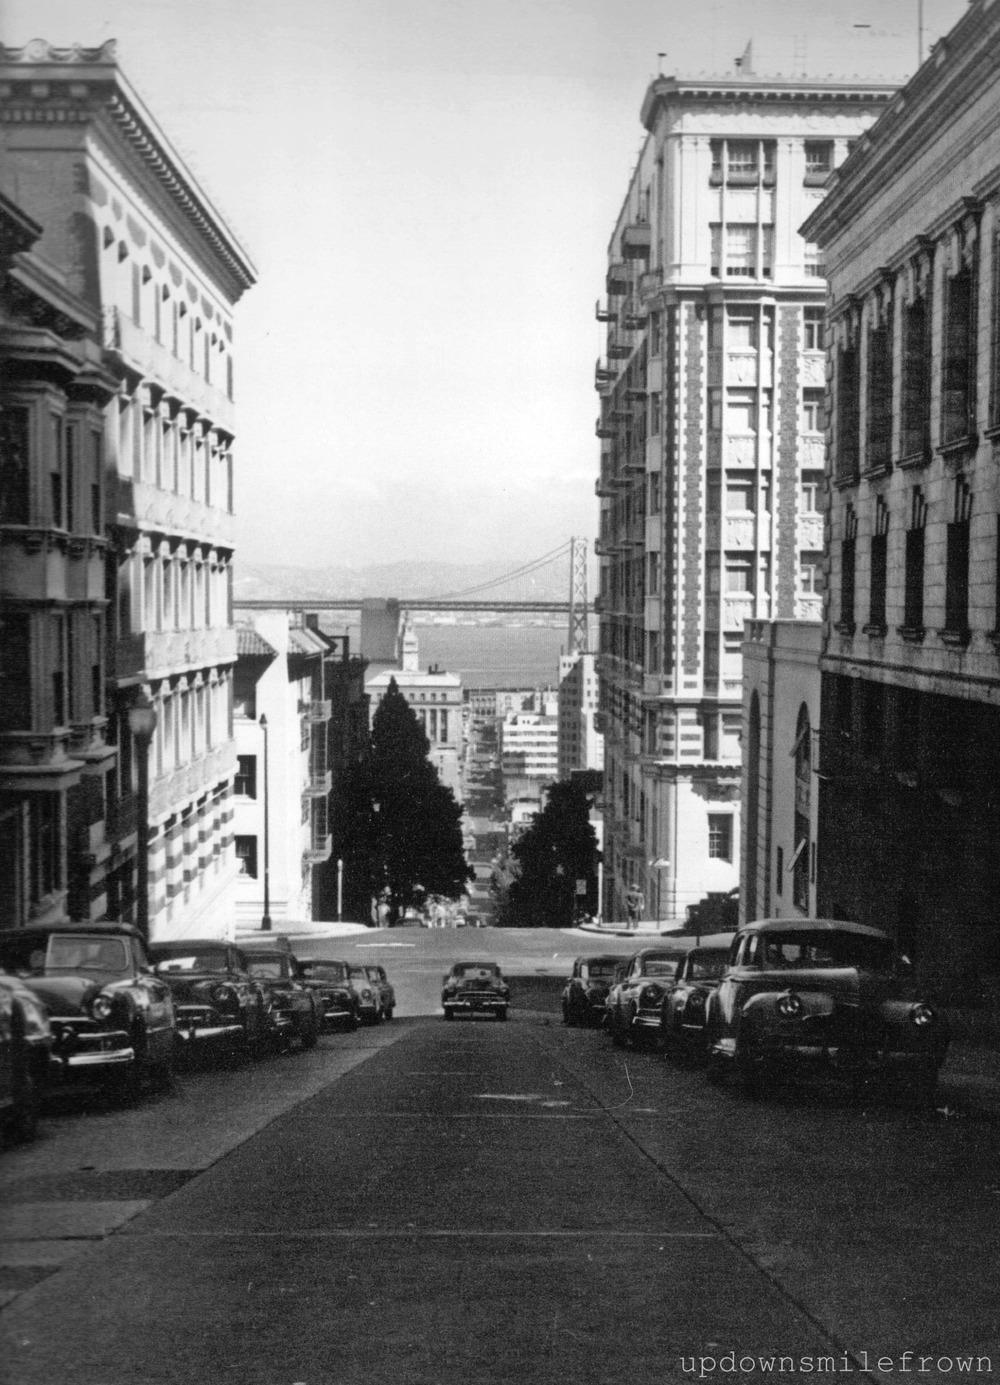 updownsmilefrown :     San Francisco   by Sammy Davis, Jr.